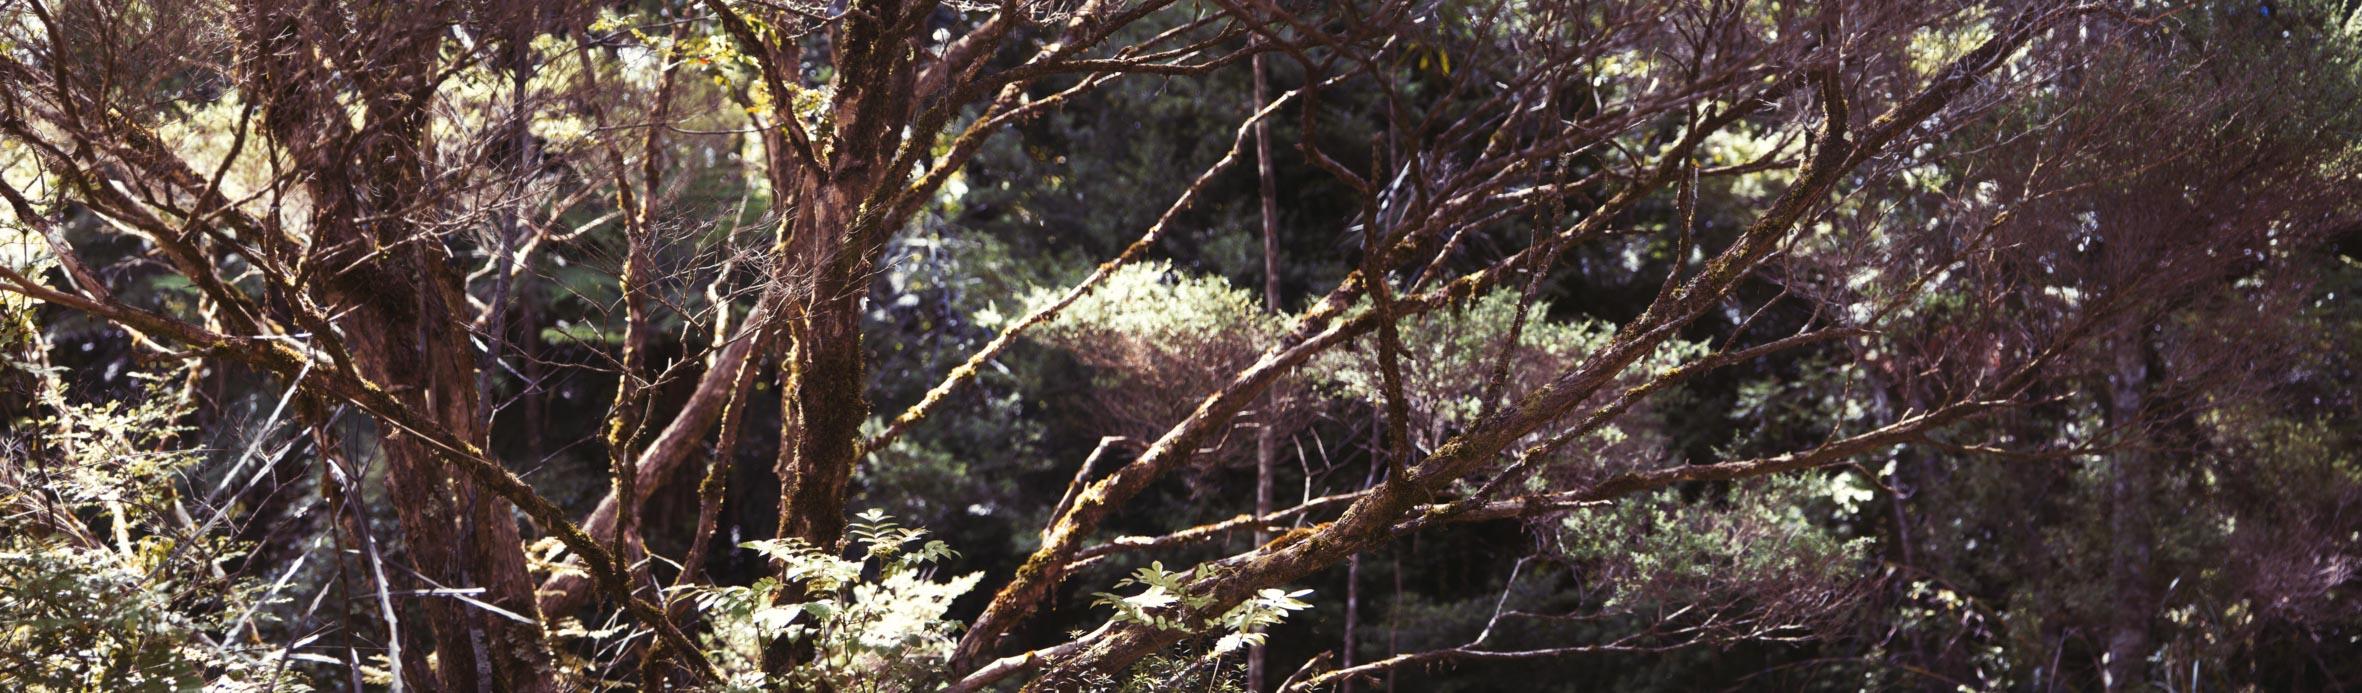 Hike-75.jpg